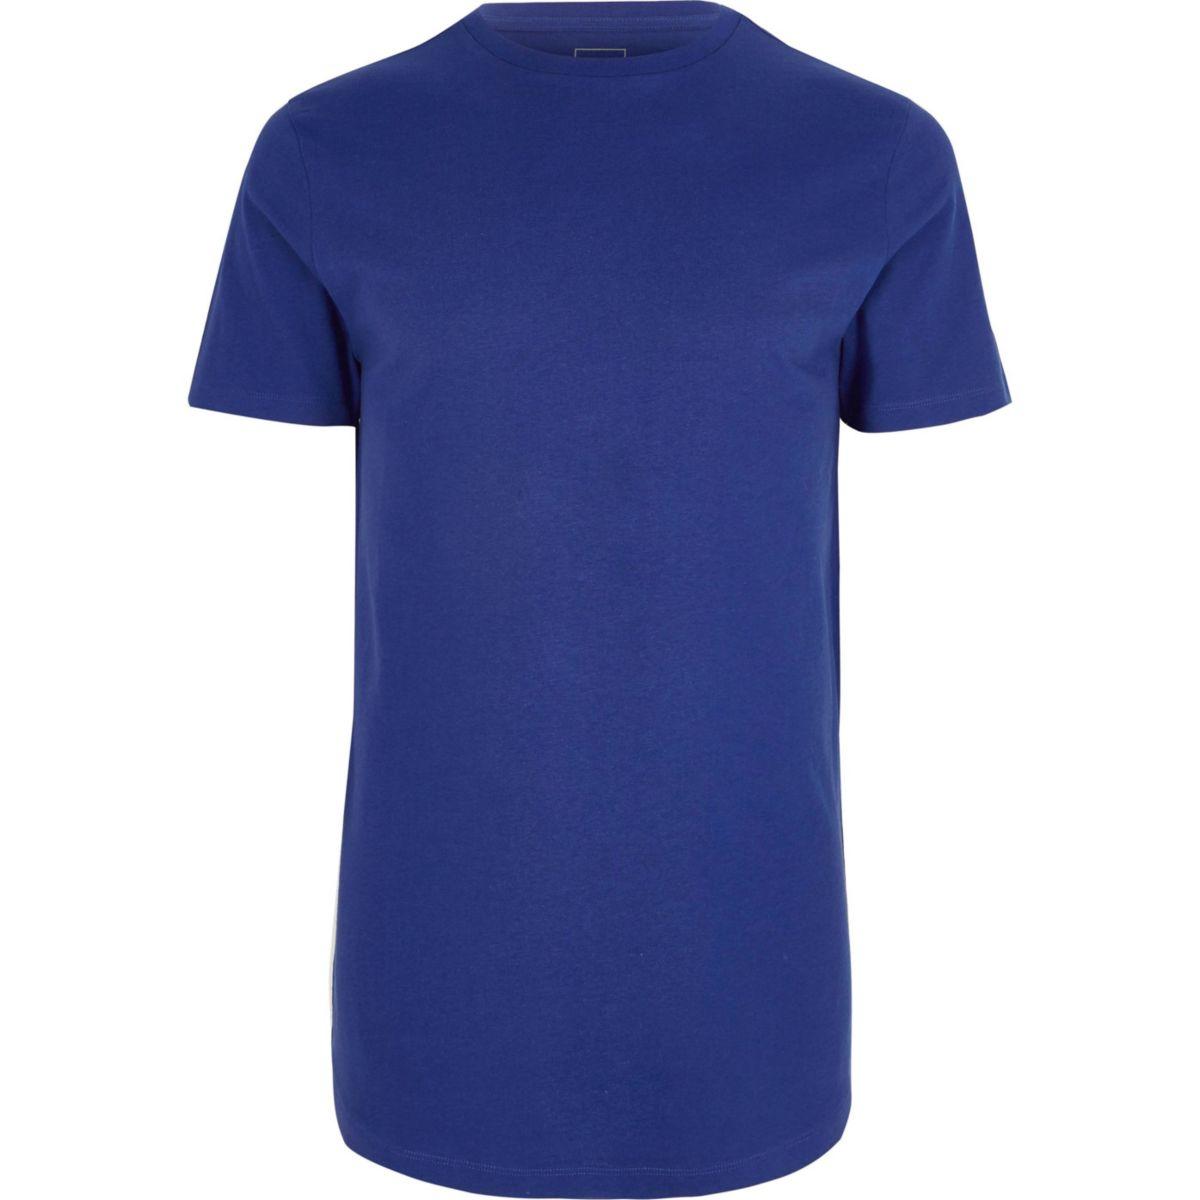 Big and tall blue curved hem t shirt t shirts t shirts for Big blue t shirts